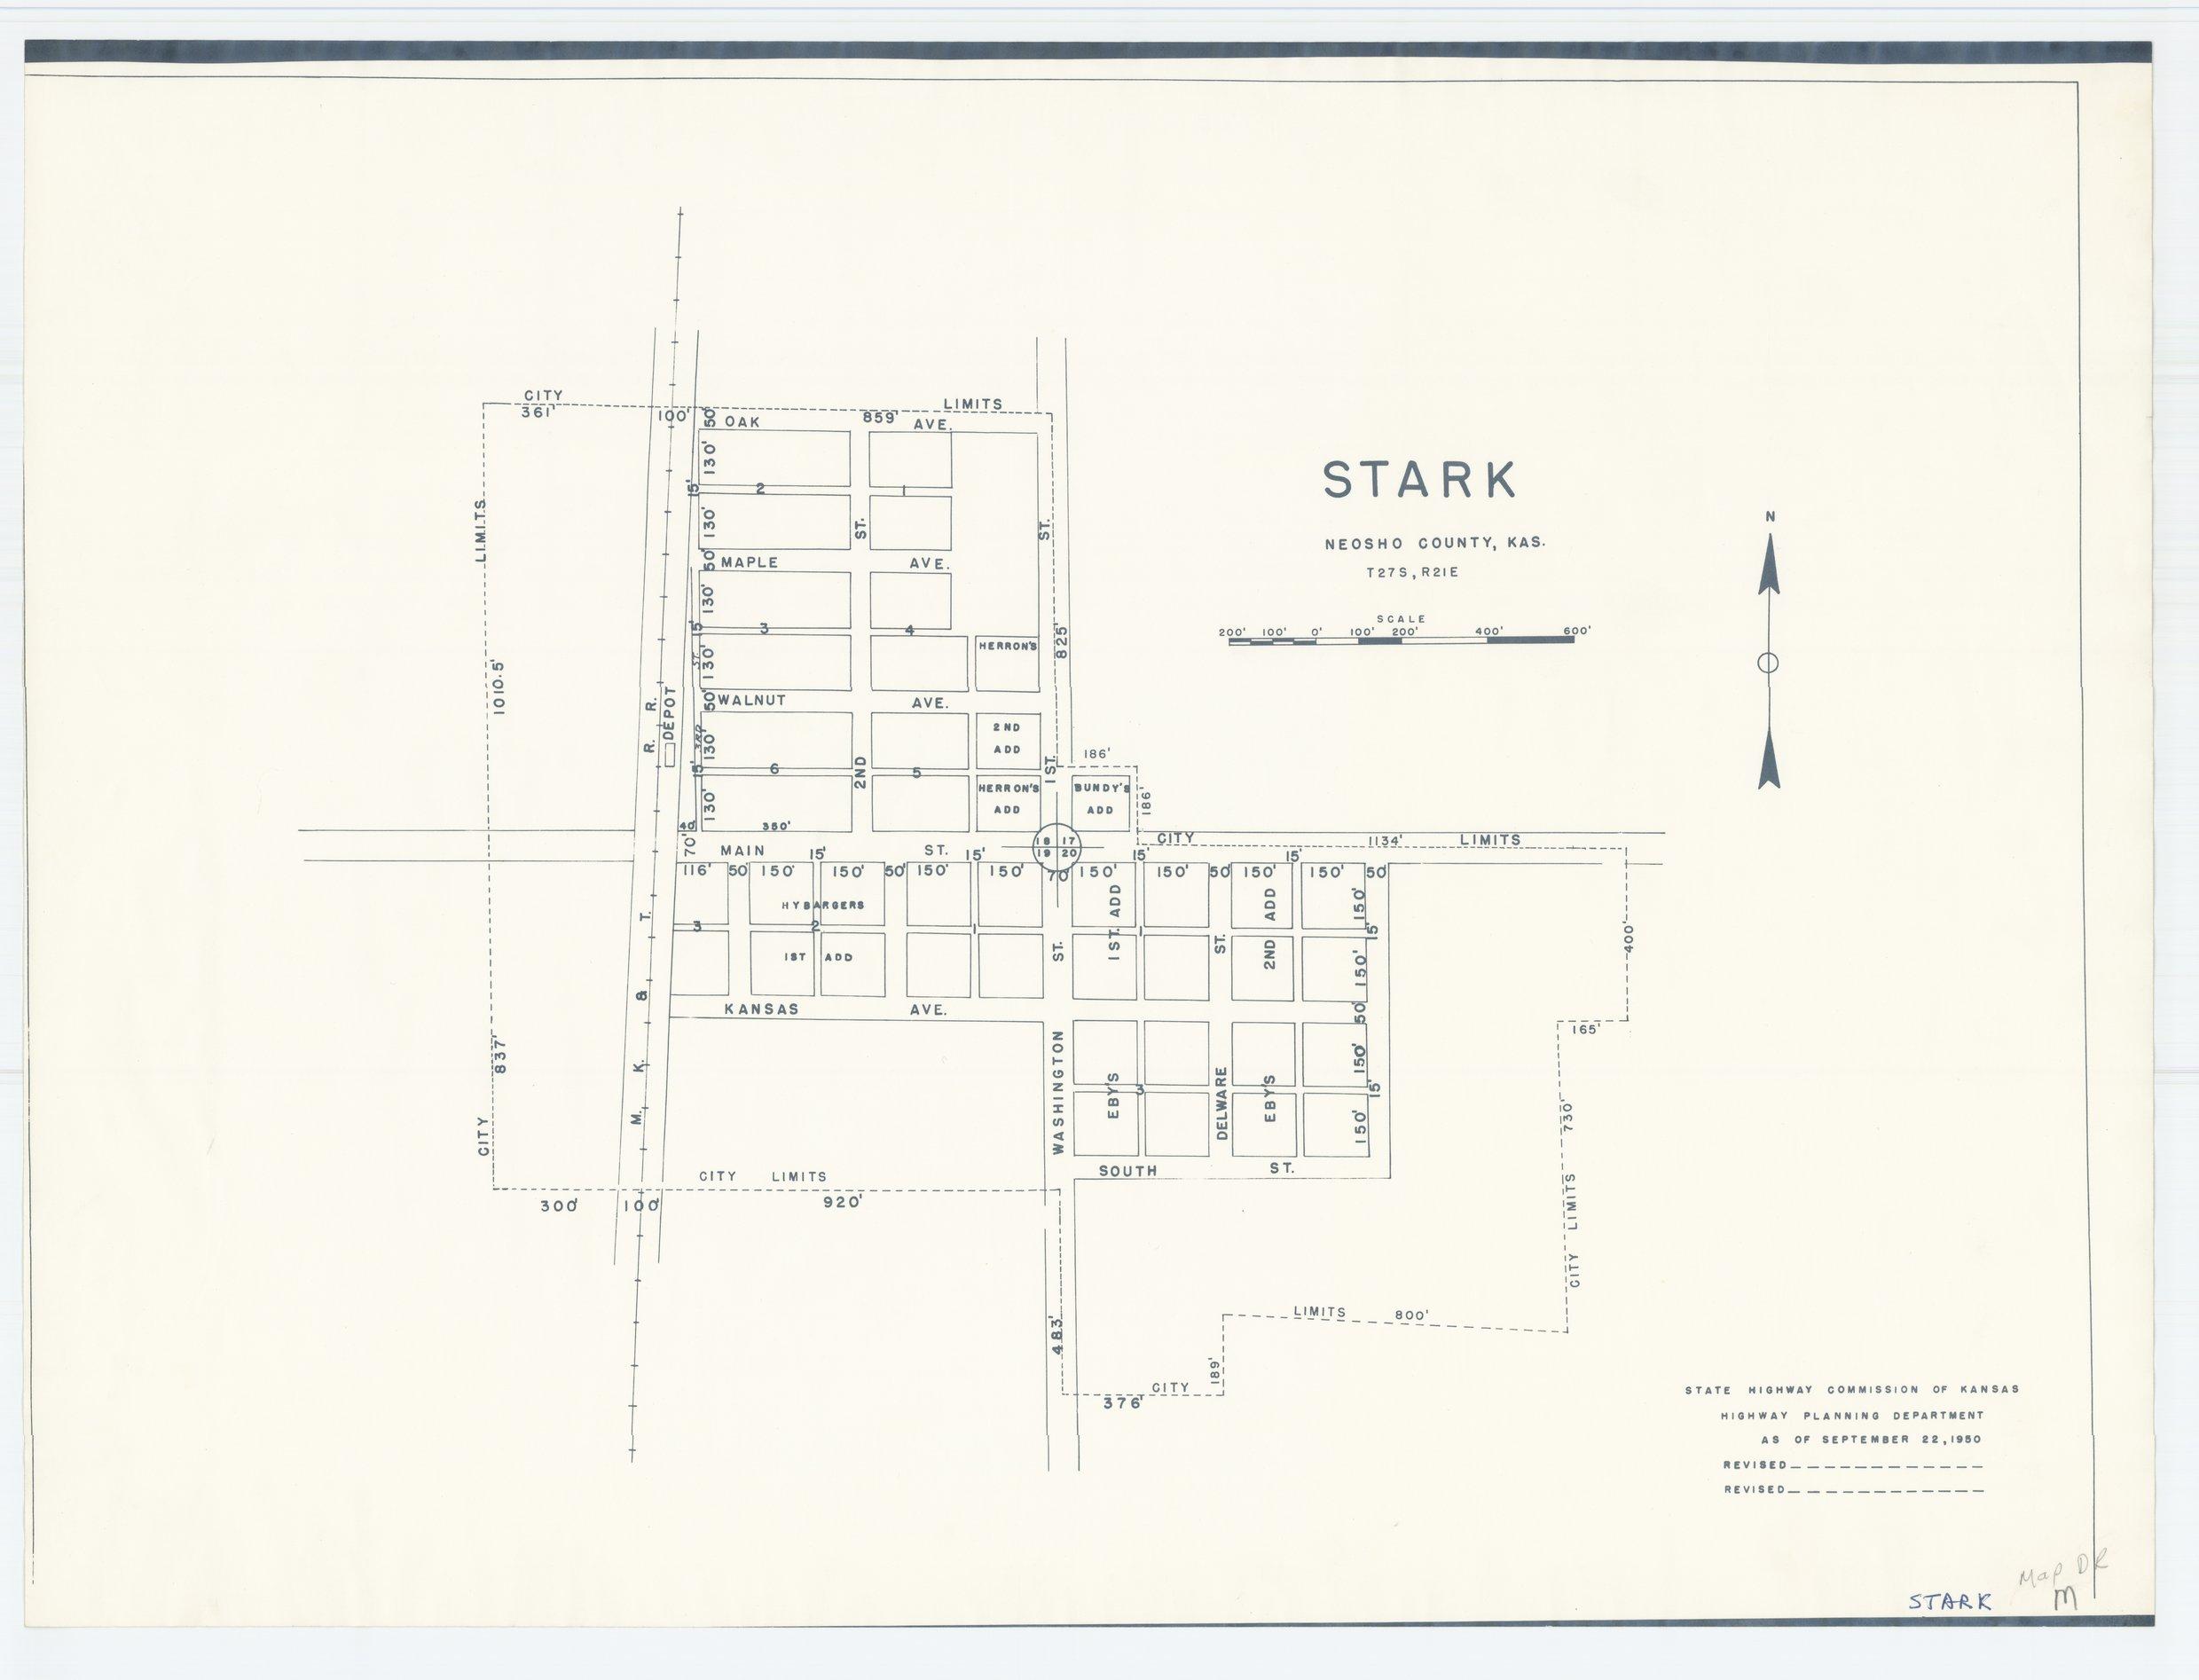 Kansas neosho county stark - Map Of Stark